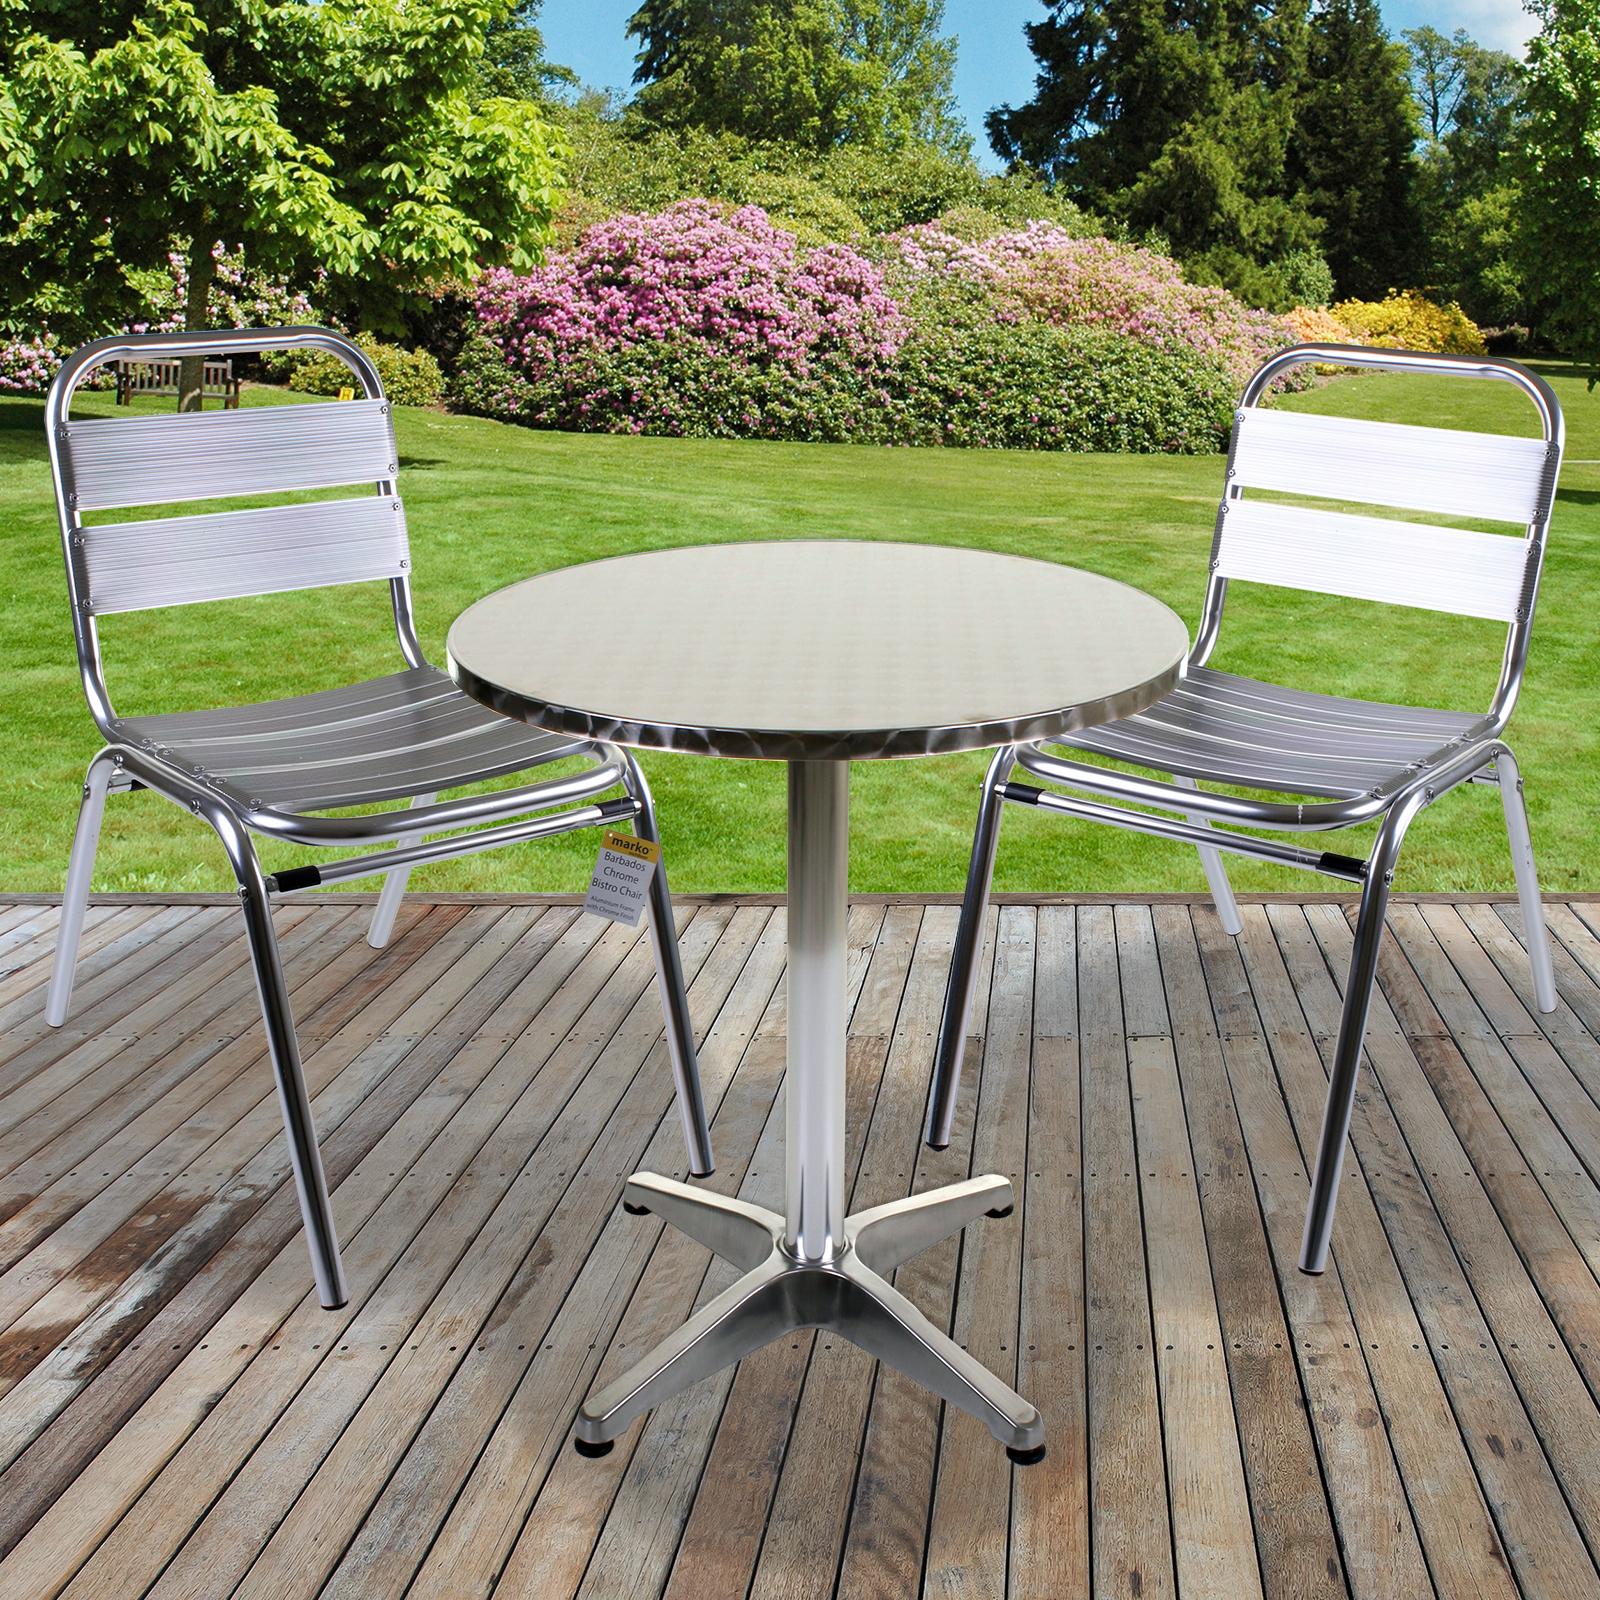 3PC Bistro Set Aluminium Lightweight Chrome Outdoor Garden Patio Furniture Metal